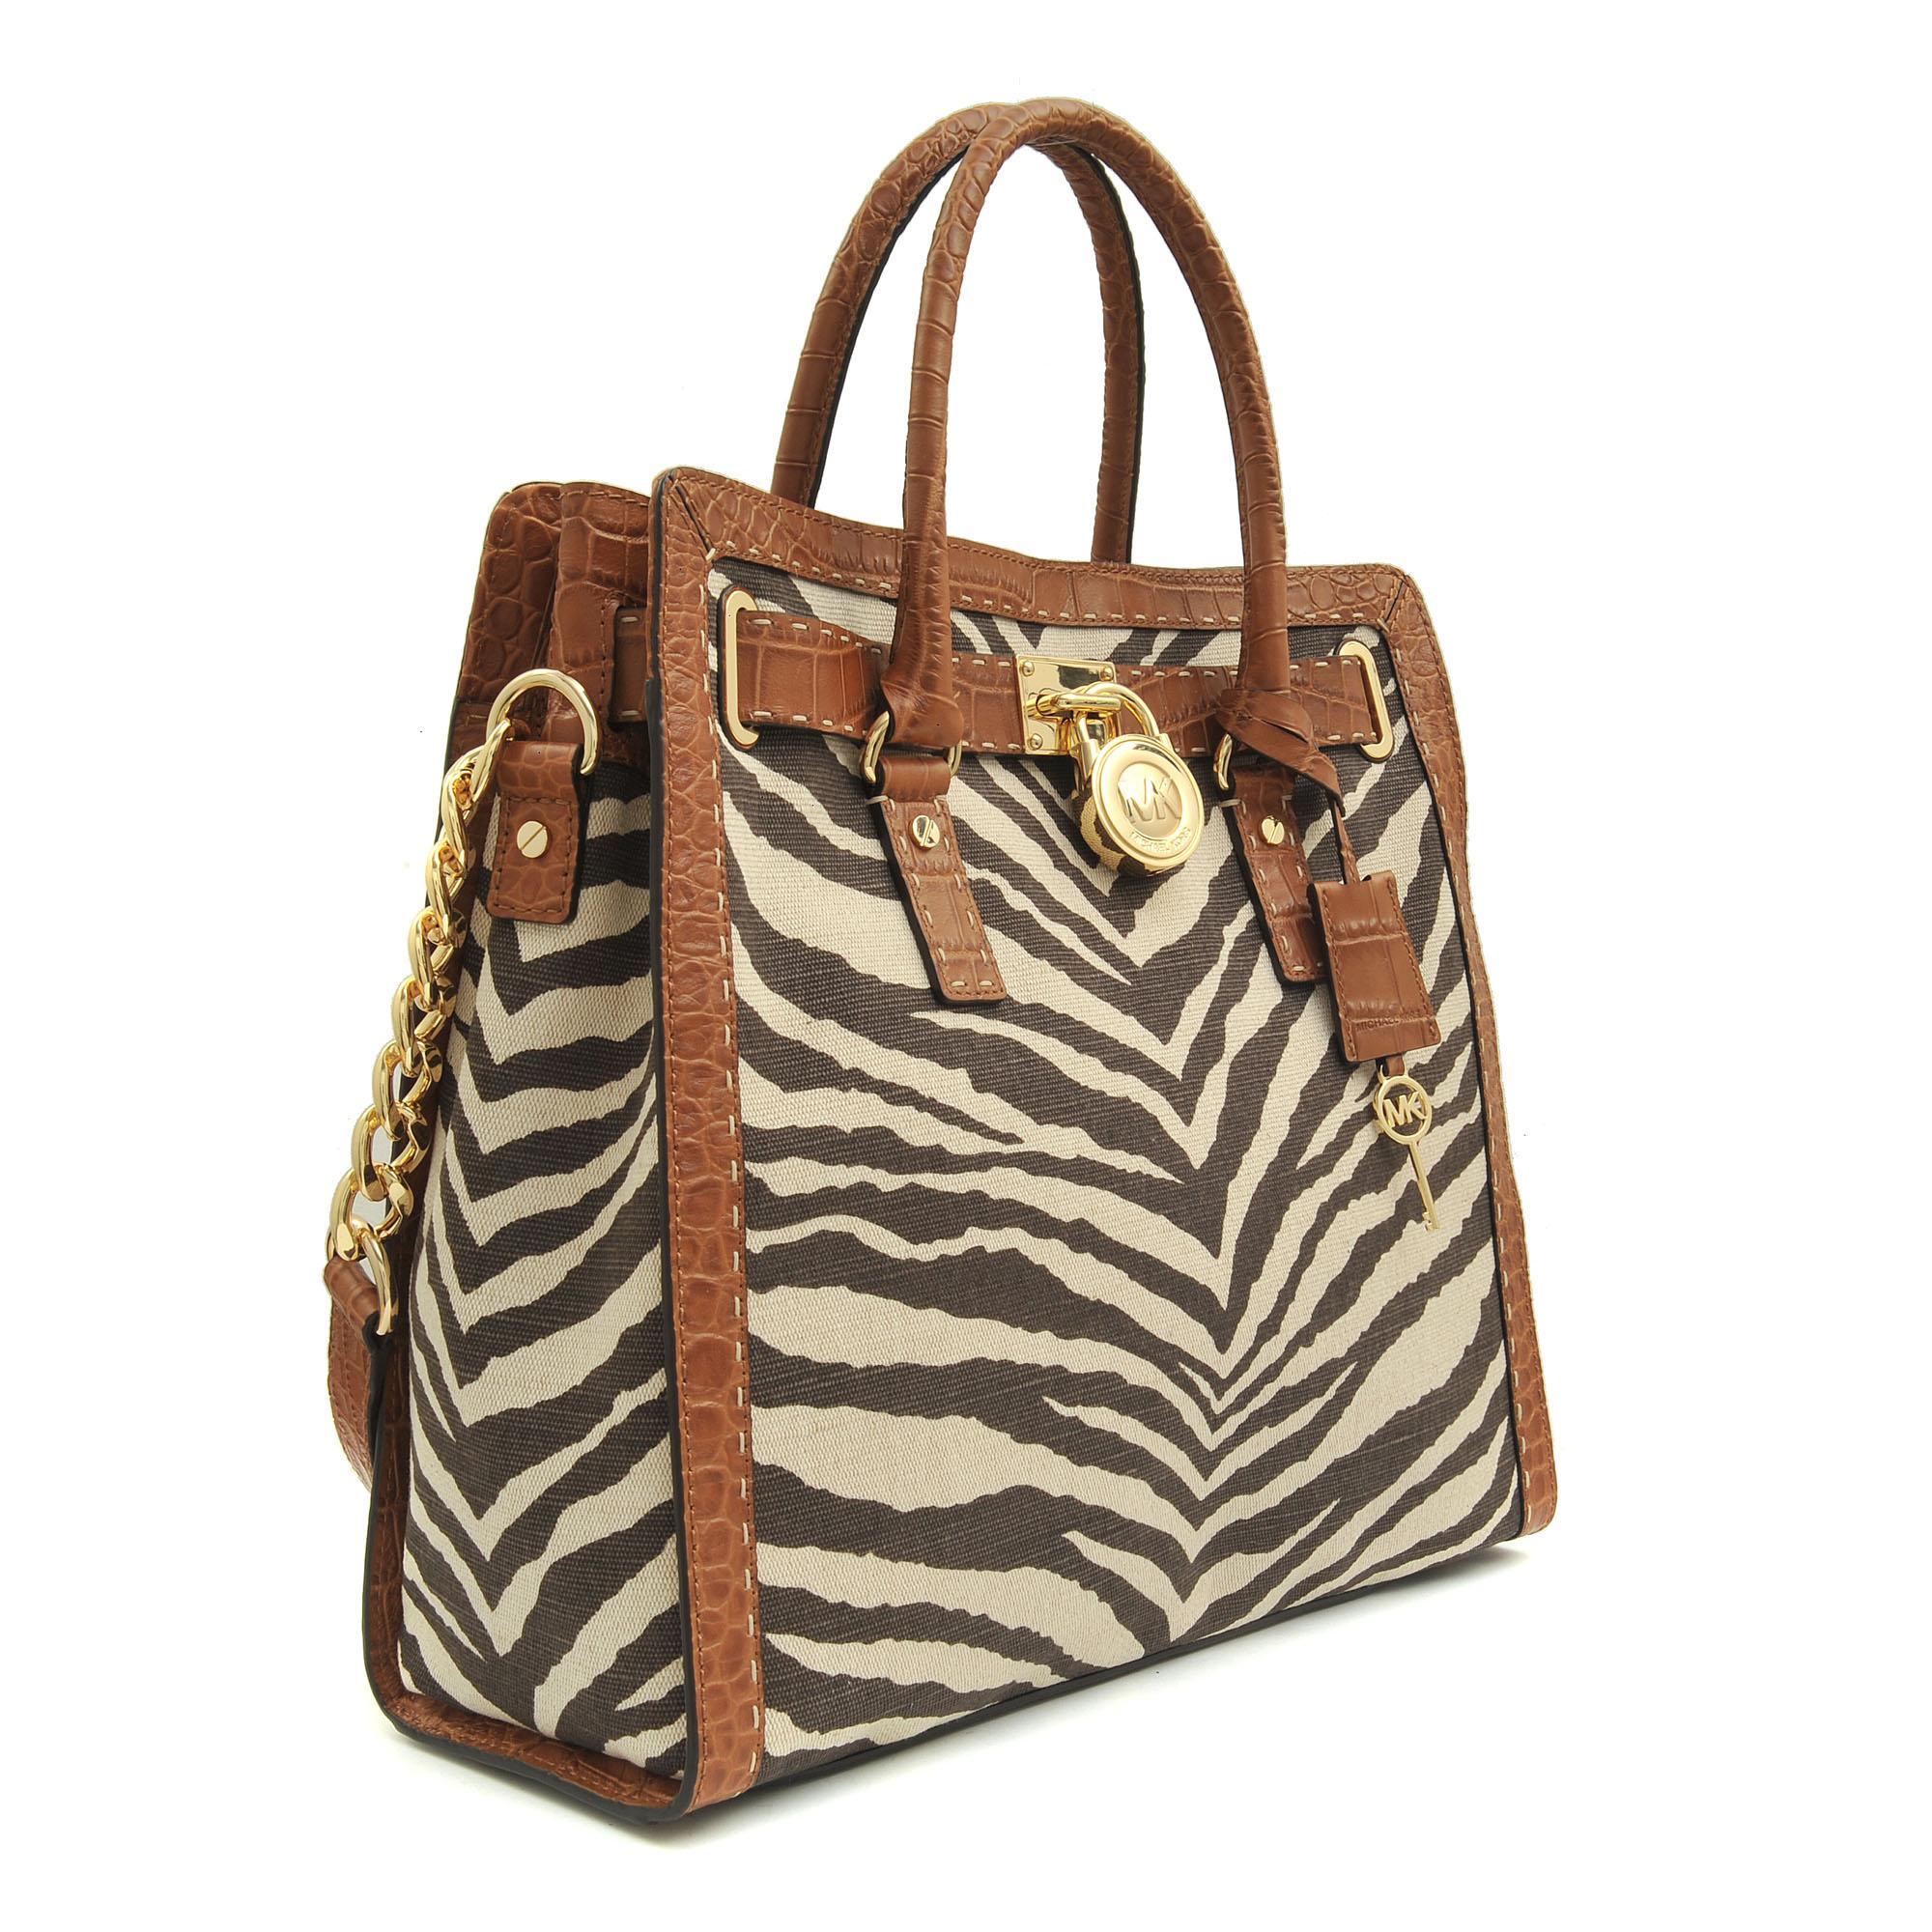 Tiger Print Luggage